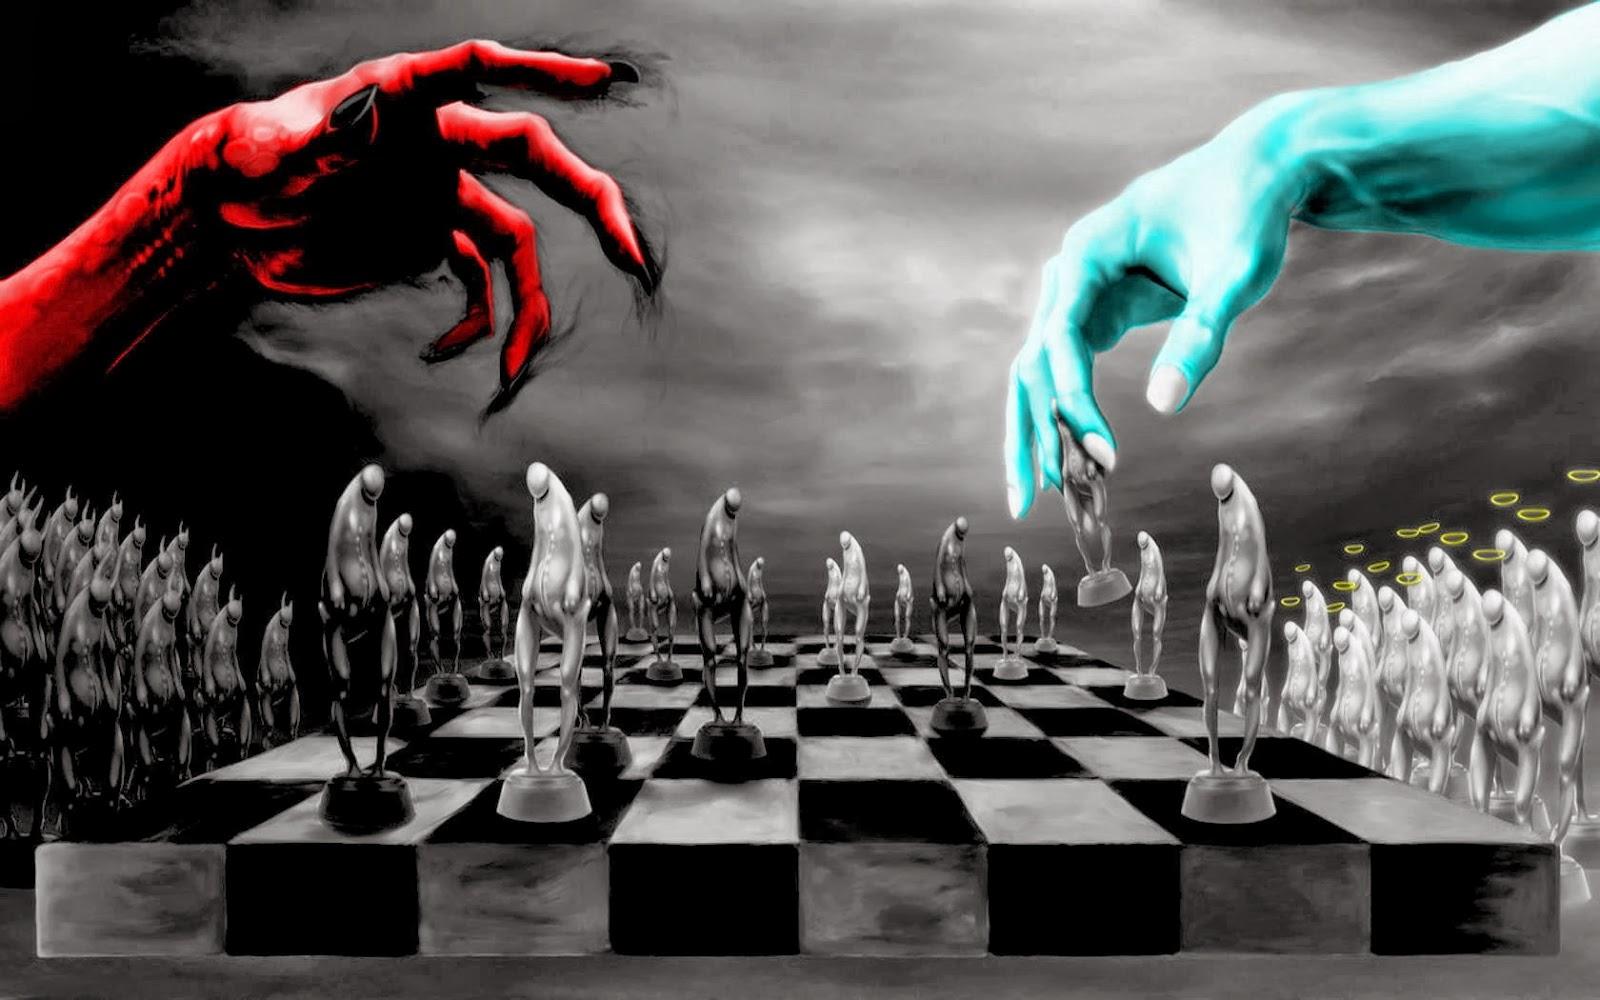 chess game mood hd wallpaper all wallpapers desktop